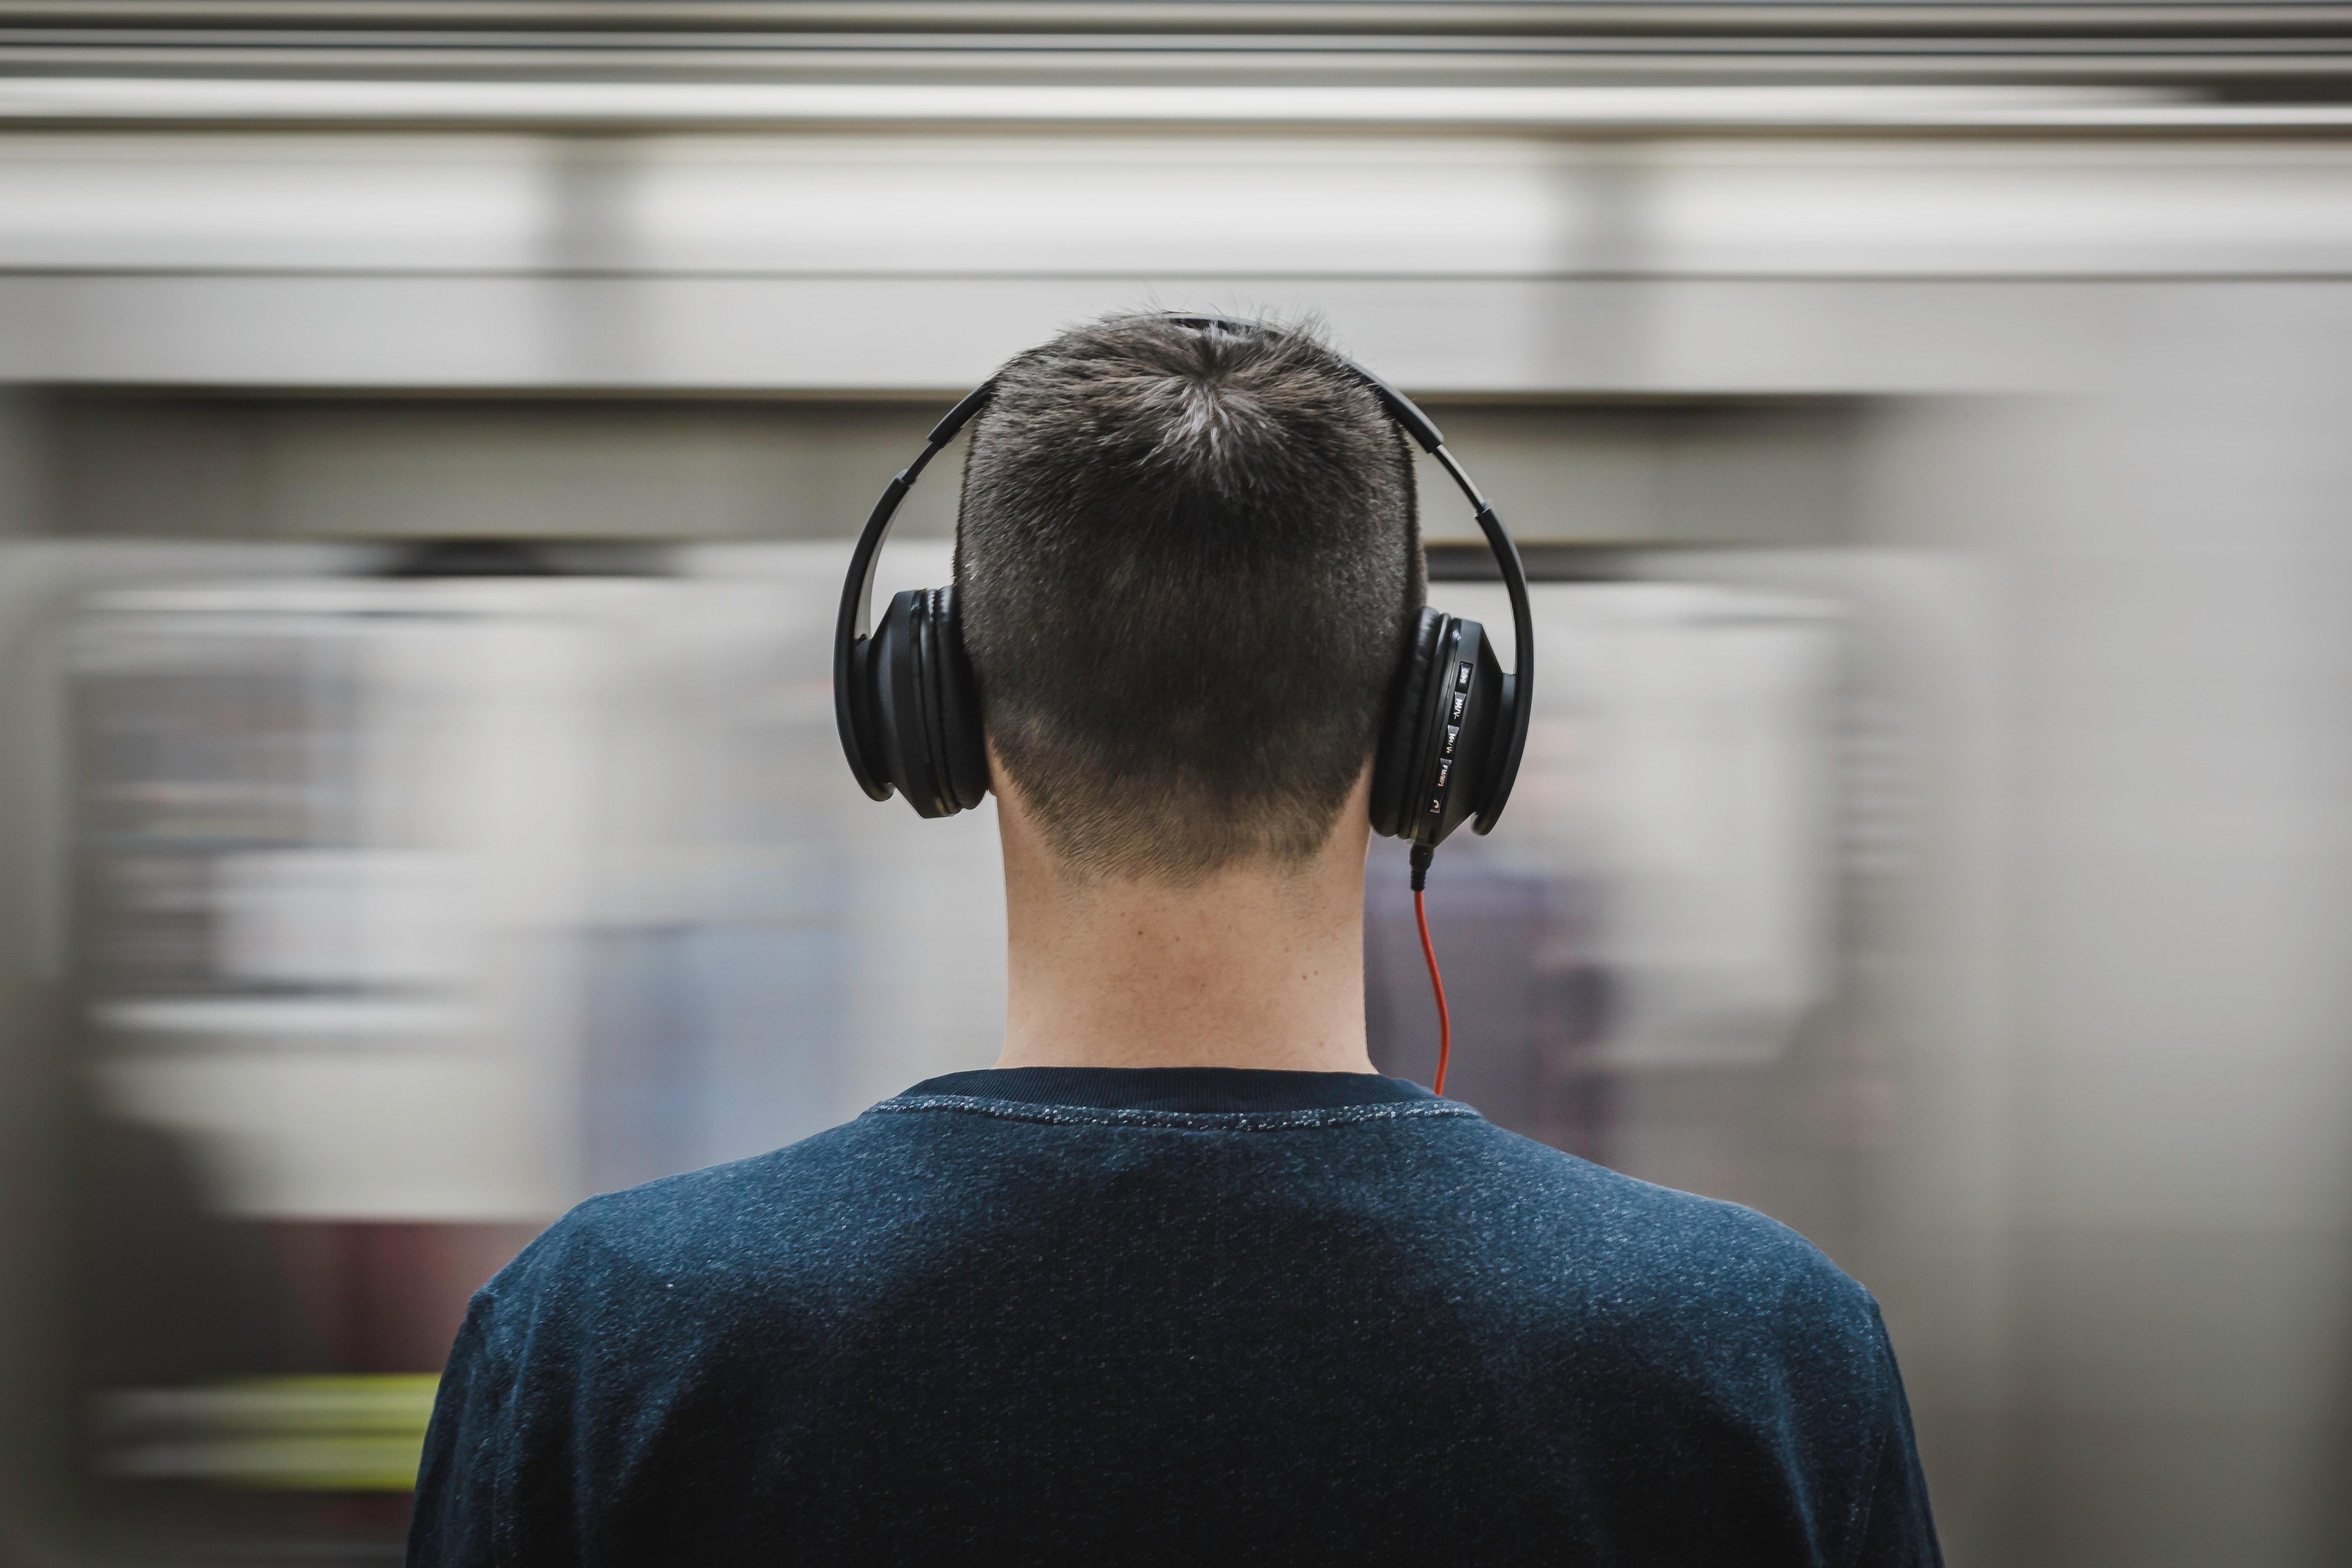 headphones-man-music-374777.jpg